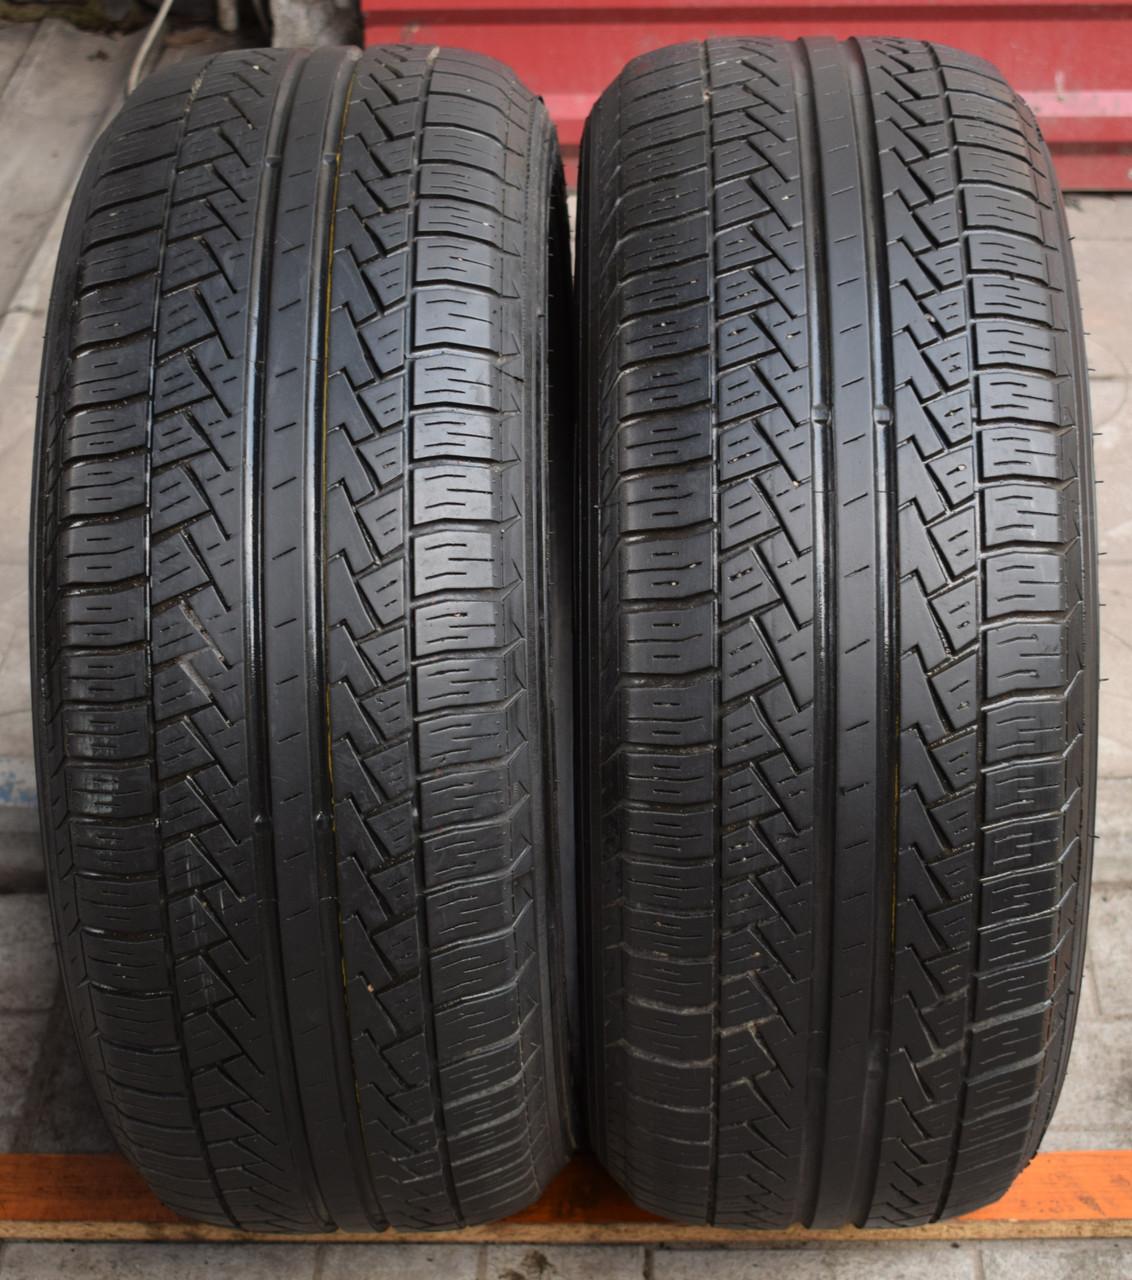 Шины б/у 235/55 R17 Pirelli Scorpion STR, всесезон-лето, пара